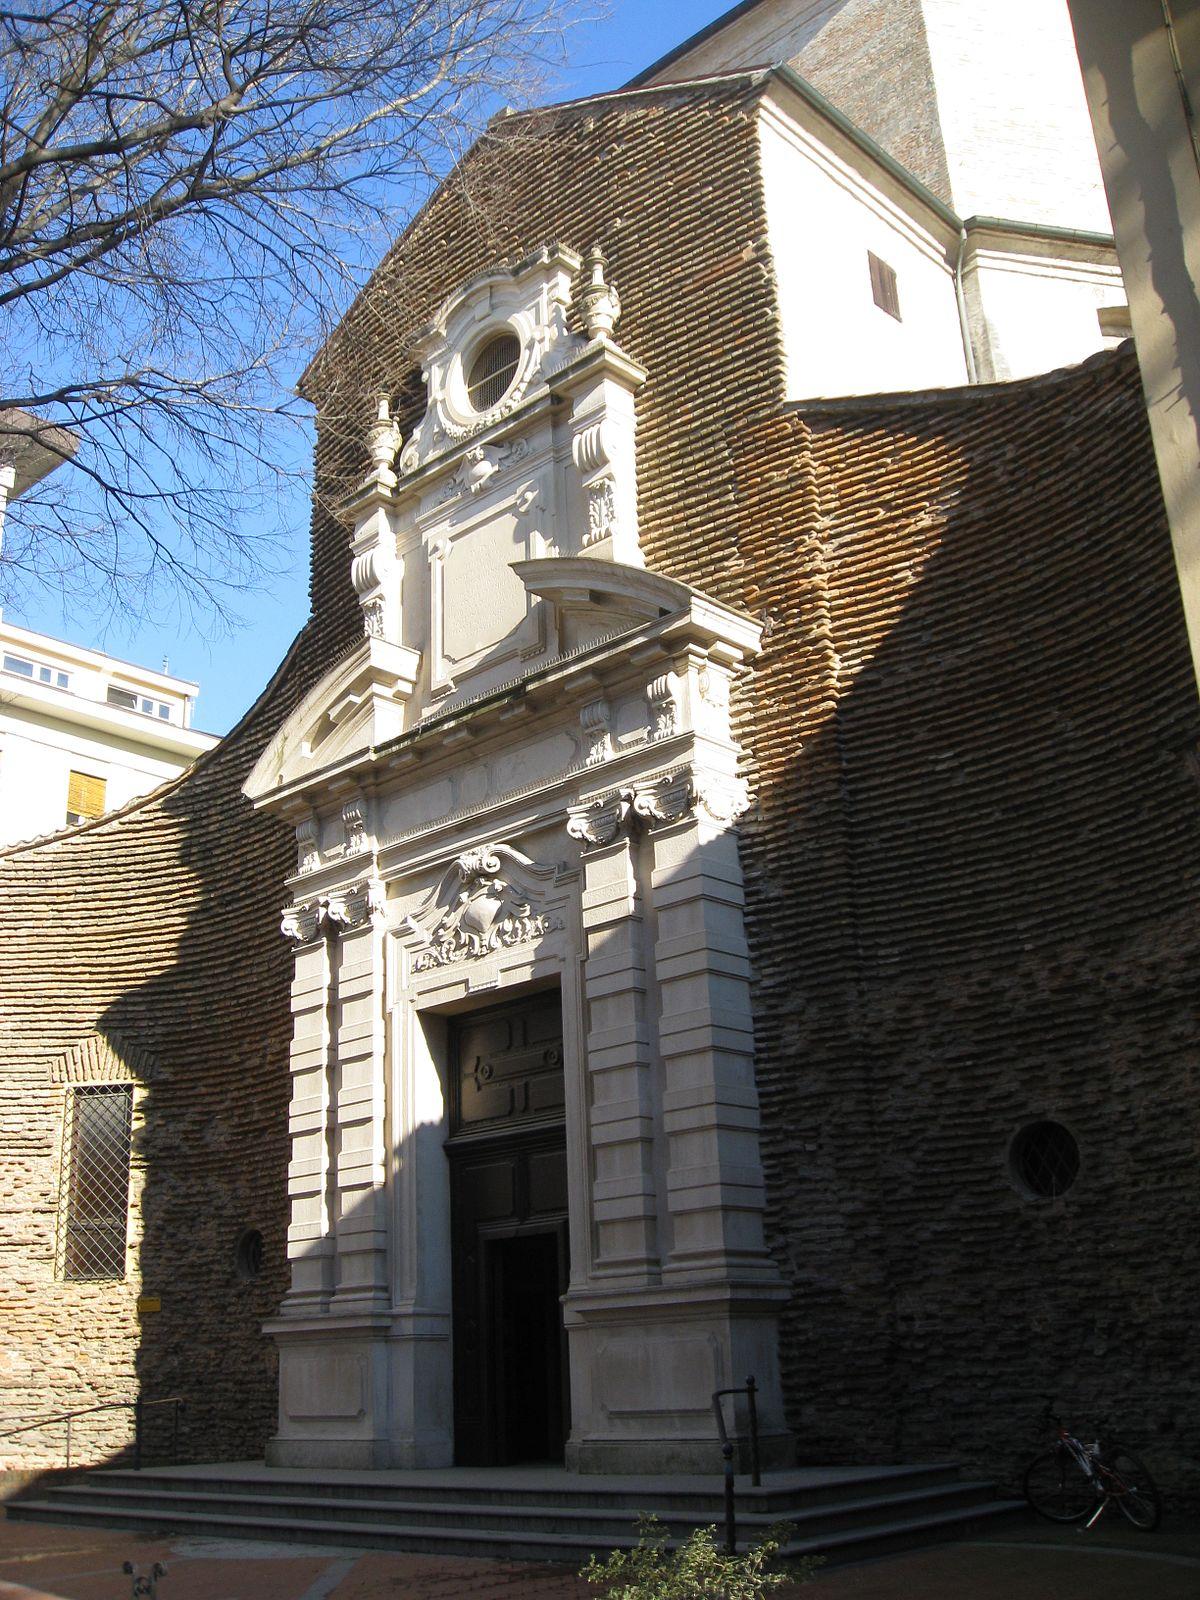 Chiesa di sant 39 antonio abate in ravaldino wikipedia for Arredo bimbo sant antonio abate